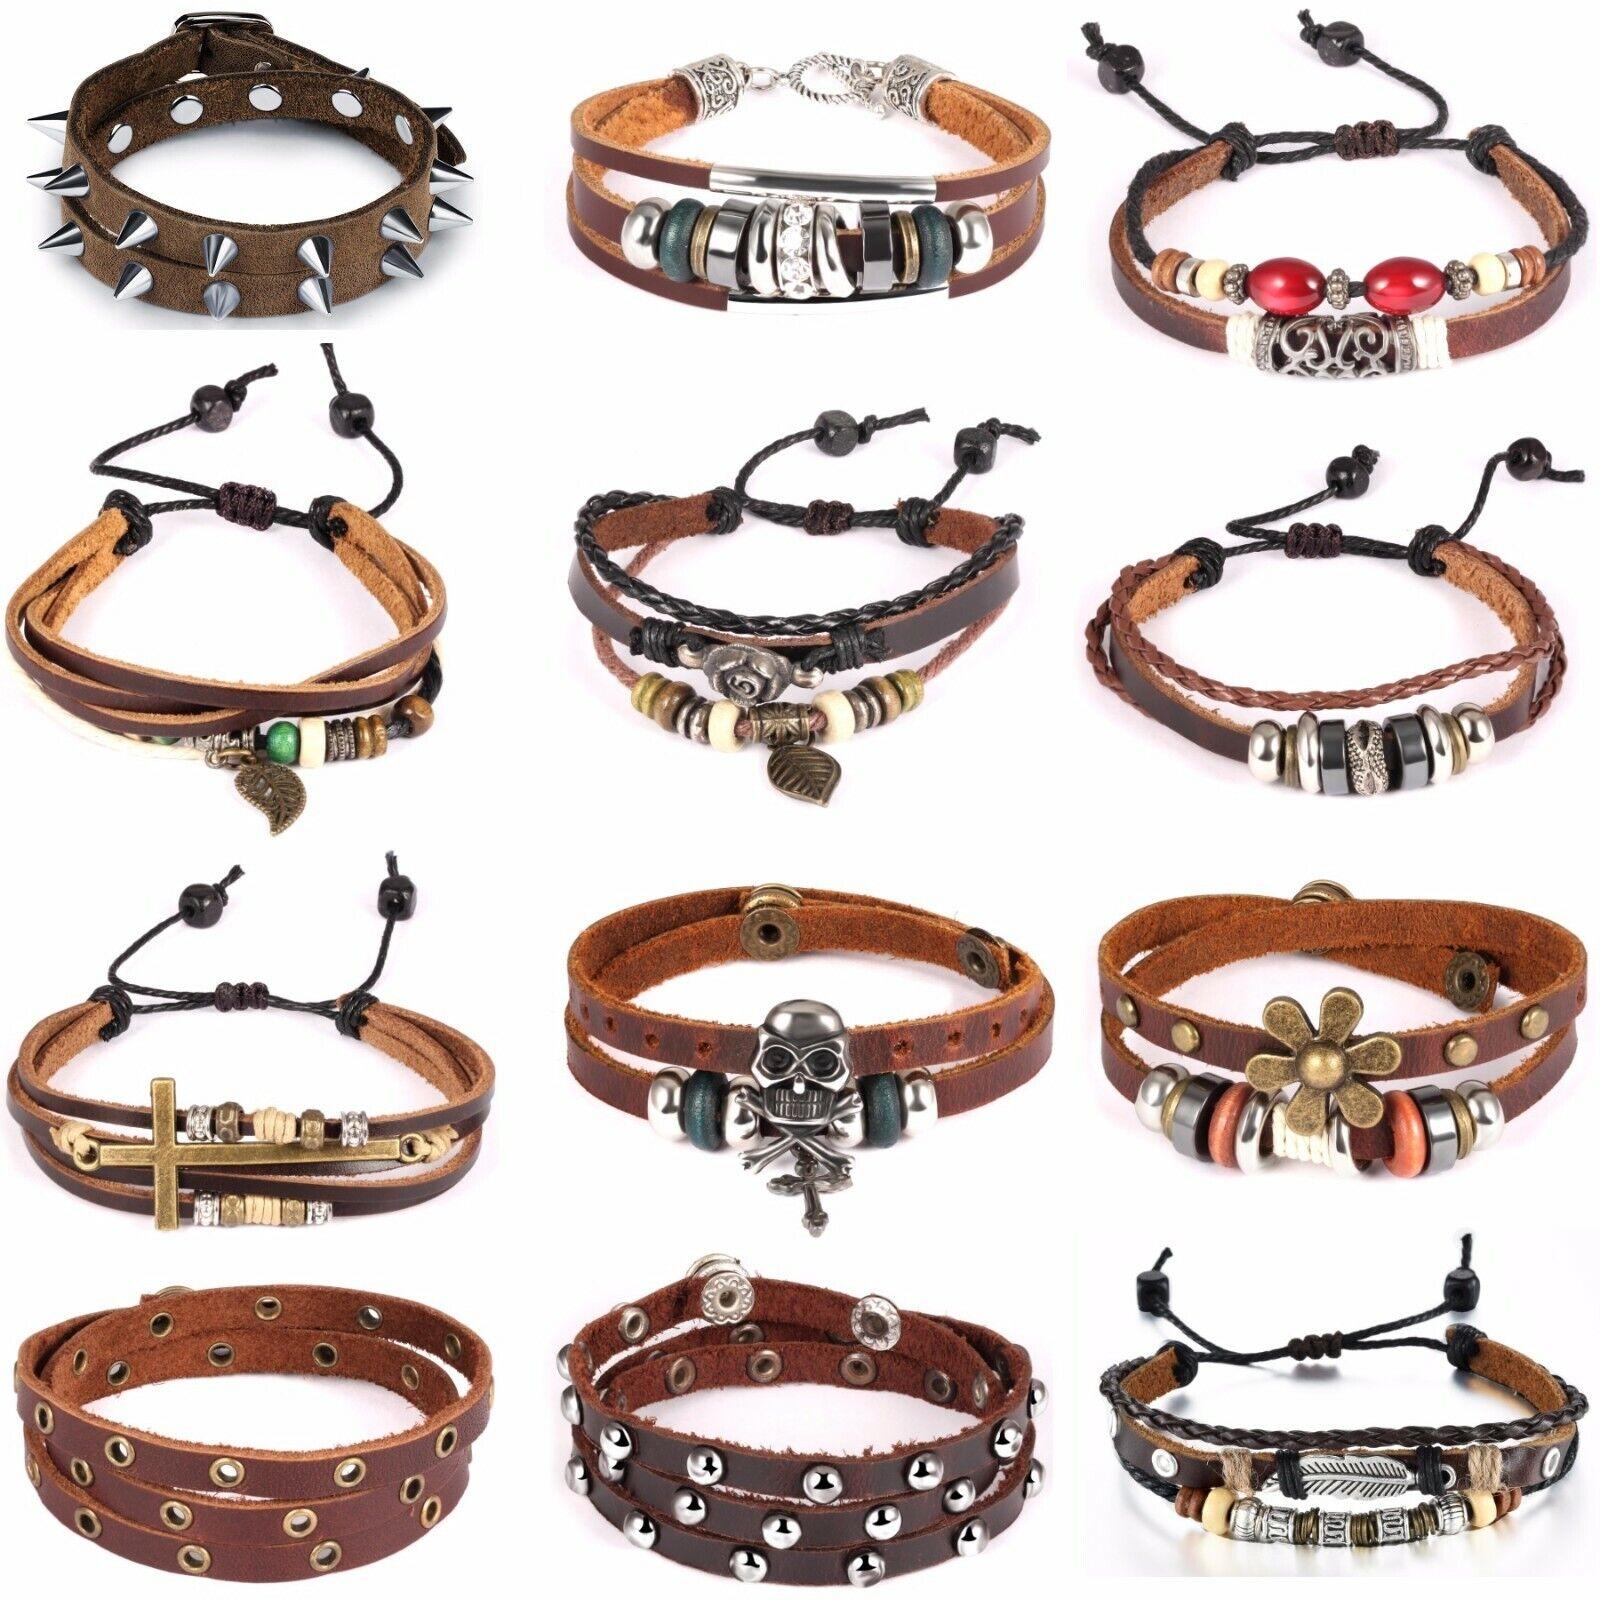 Damen Herren Armband Leder Legierung Vintage Armreif Armkette Braun Schmuck